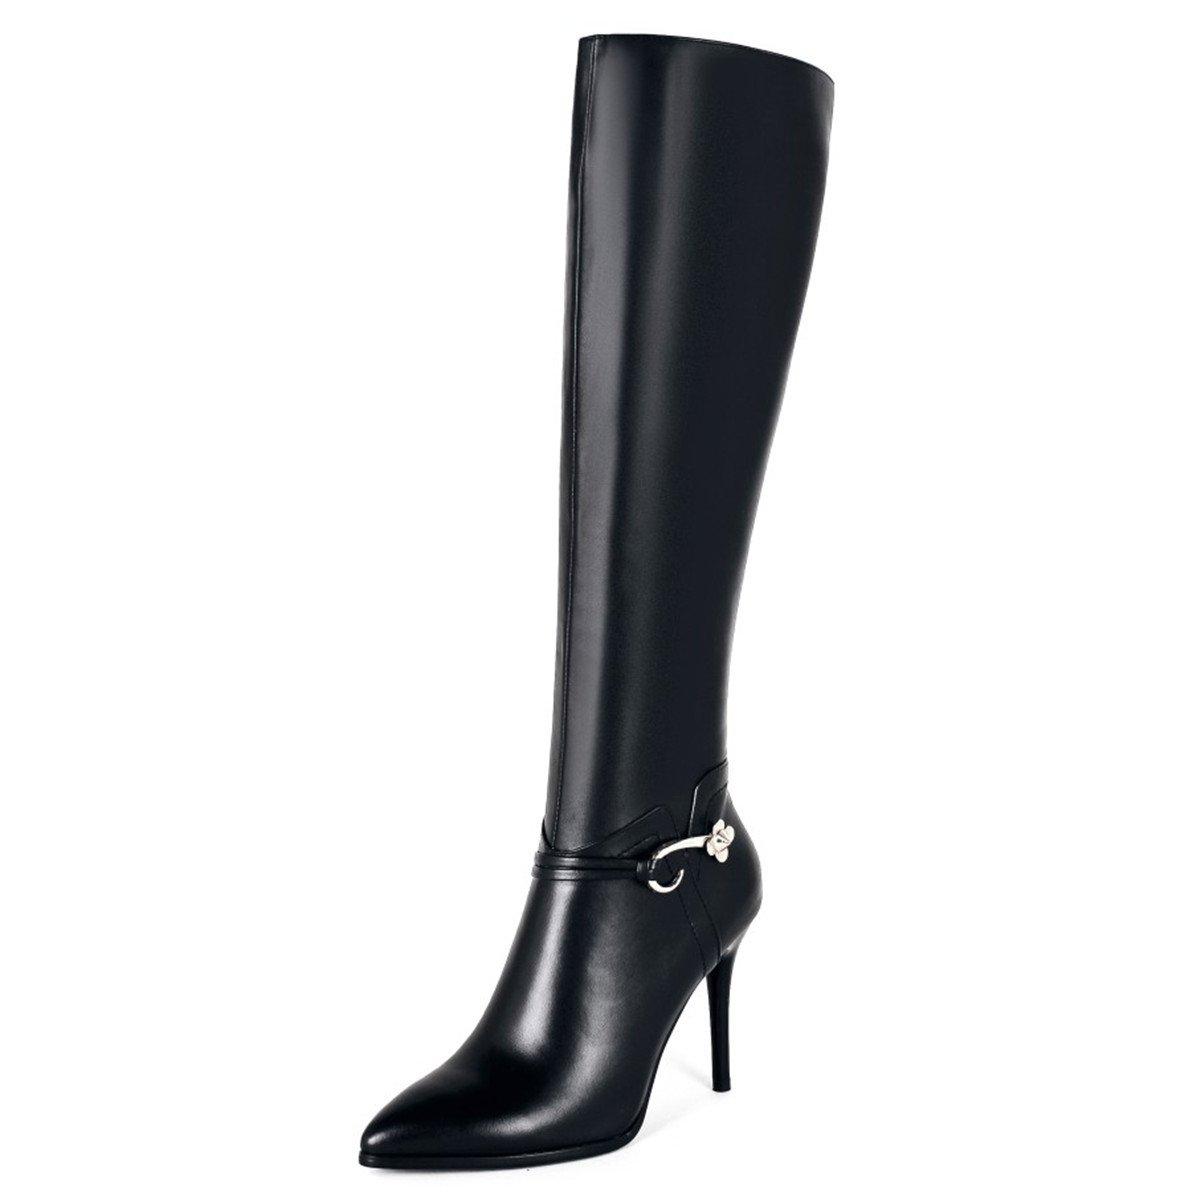 Jiame Women's Zipper Pointed Toe High Heel Stiletto Black Knee High Tall Dress Boots (7.5B(M) US(Asia 39), Black-1)